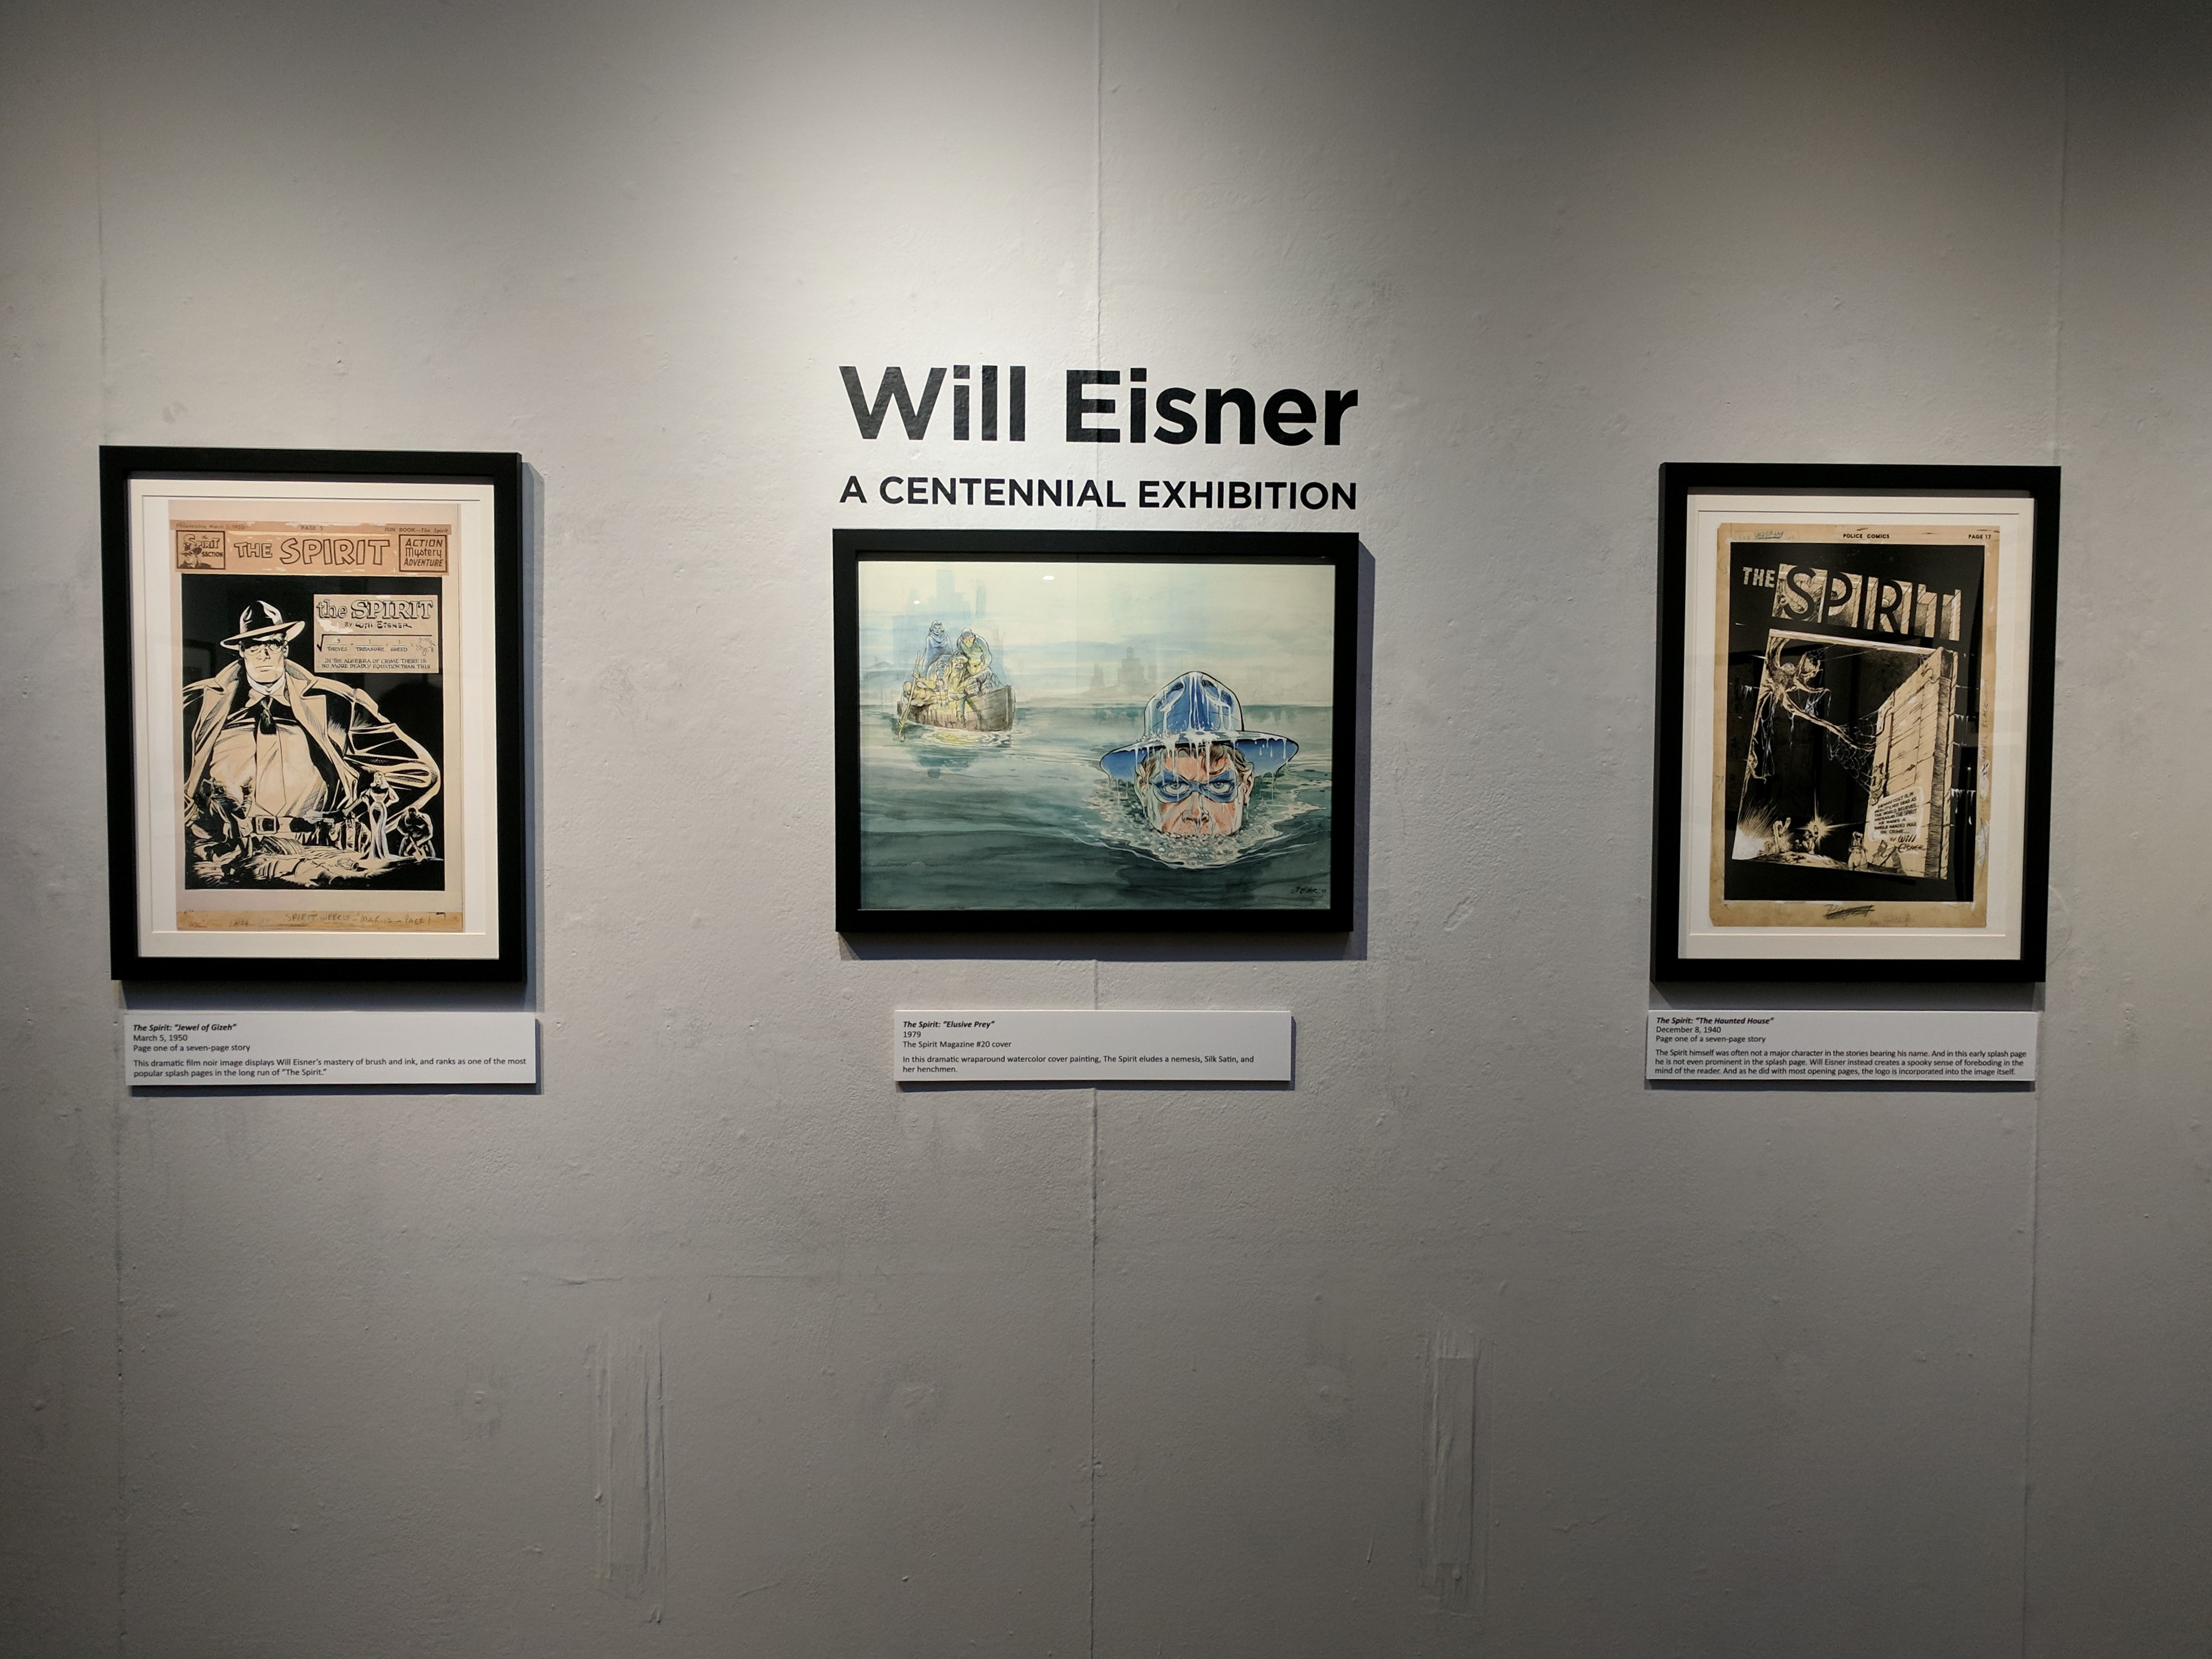 http://www.willeisner.com/the_eisnershpritz/WESI_Lakes_Giclee_Exhibit.jpg